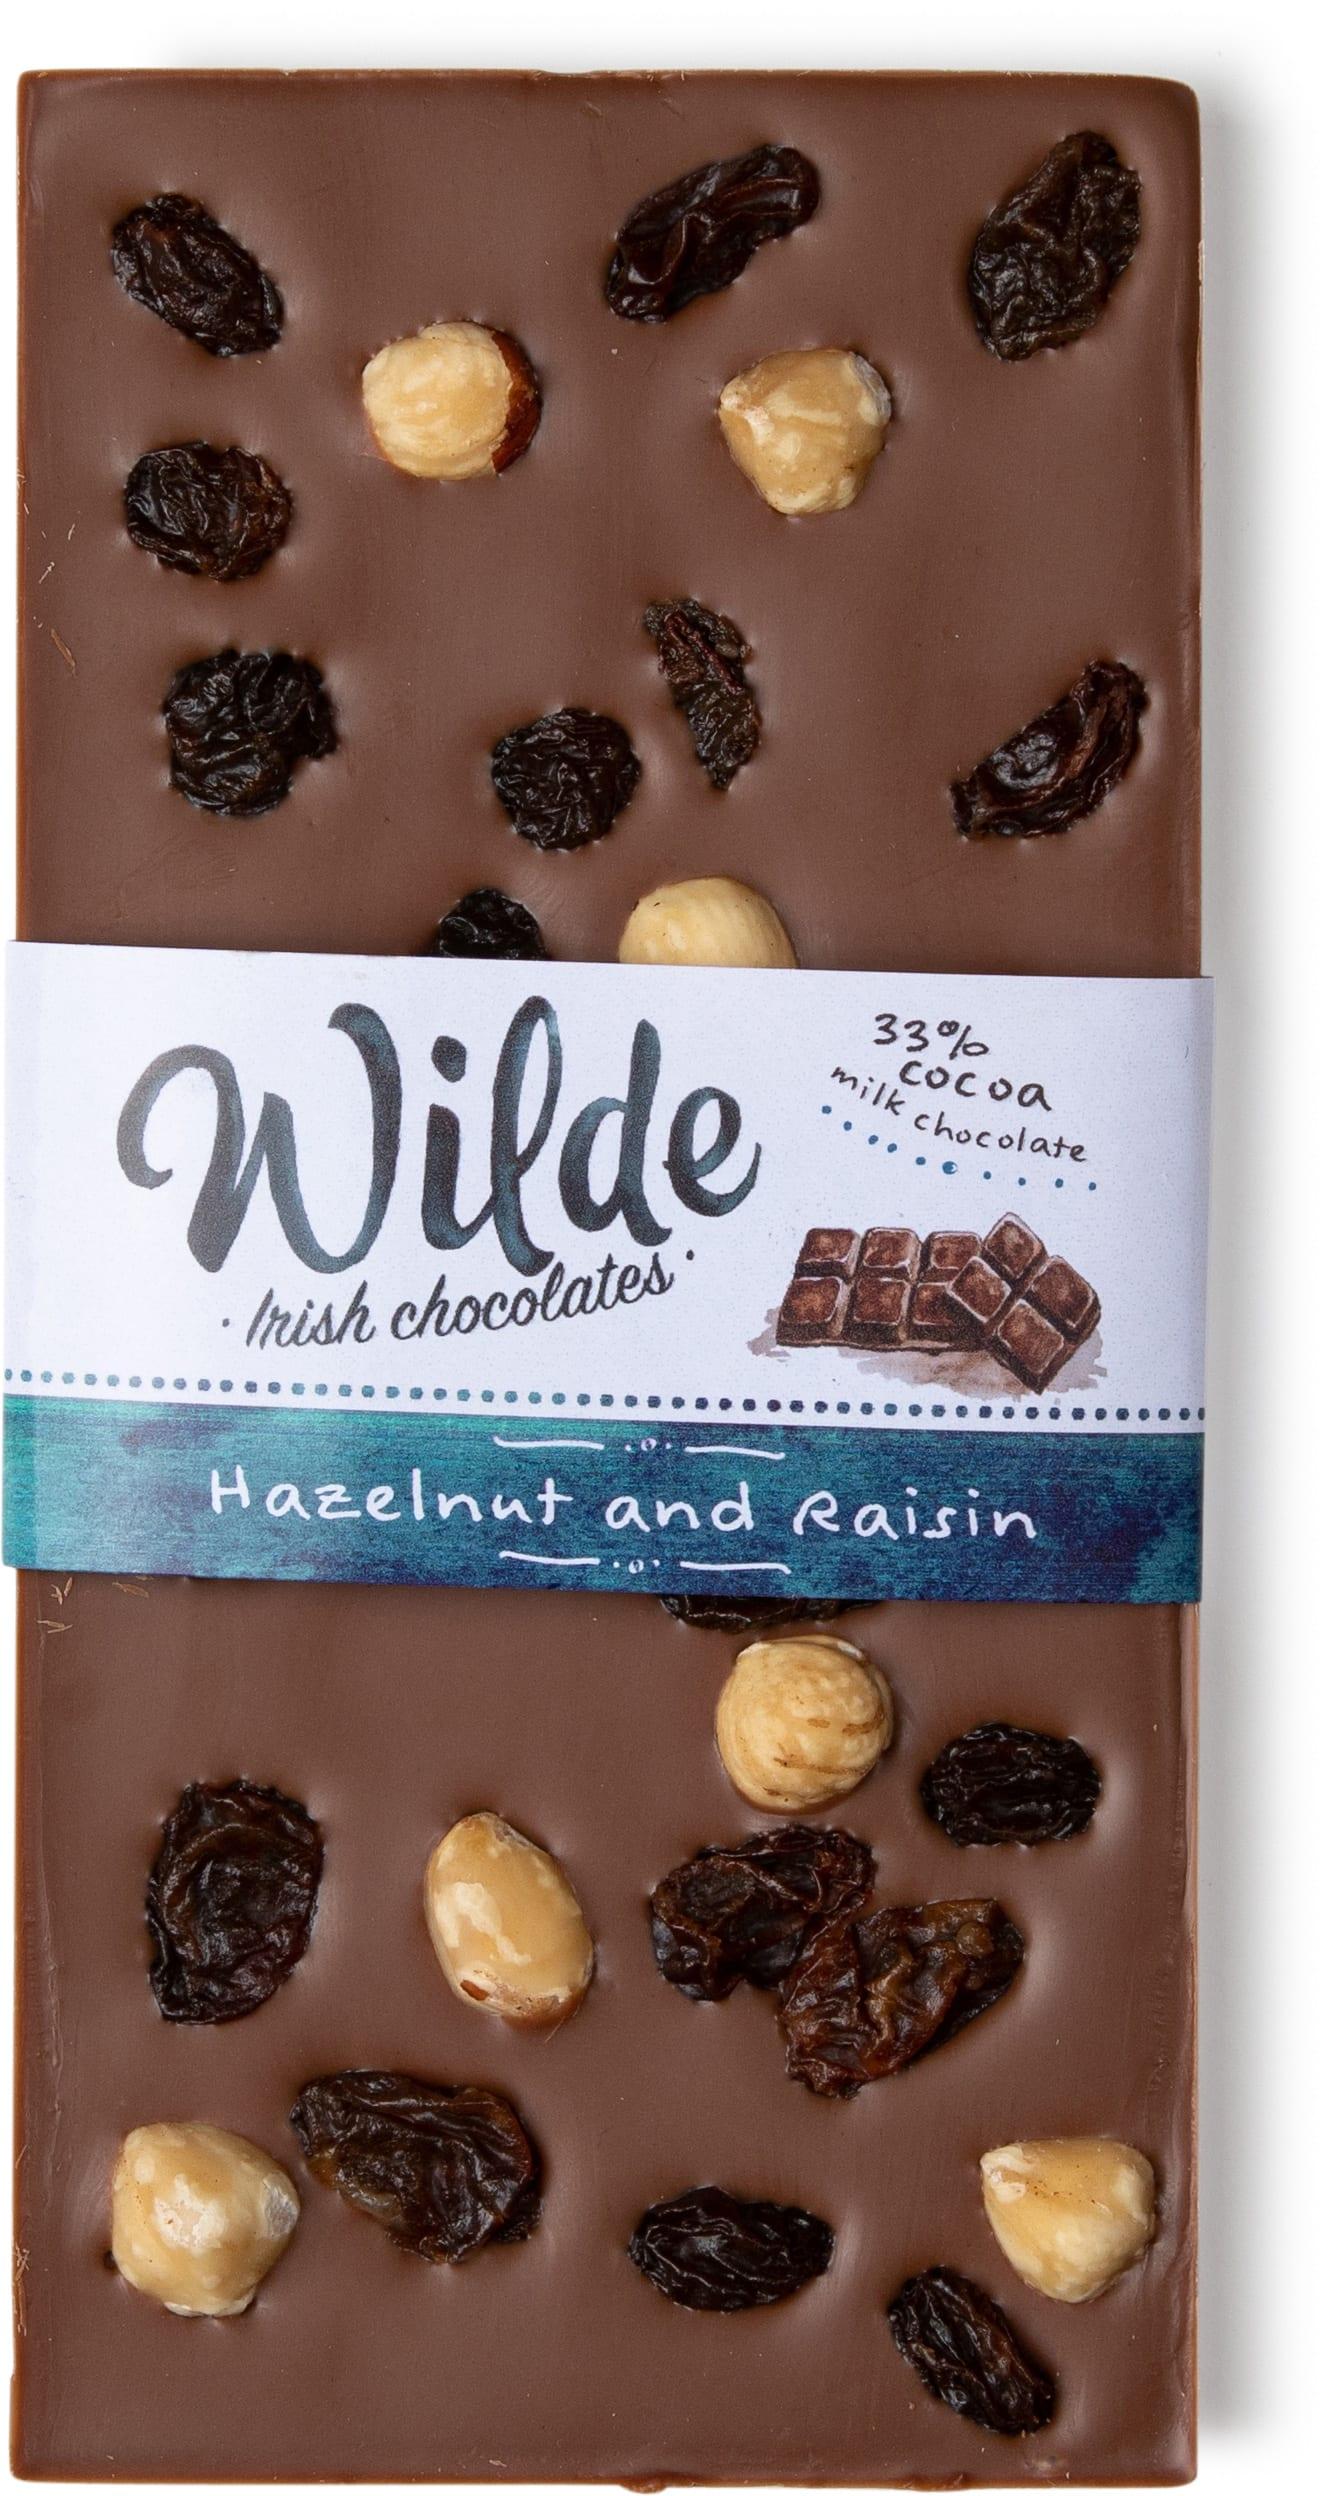 Hazelnut and Raisin bar - Wilde Irish Chocolates